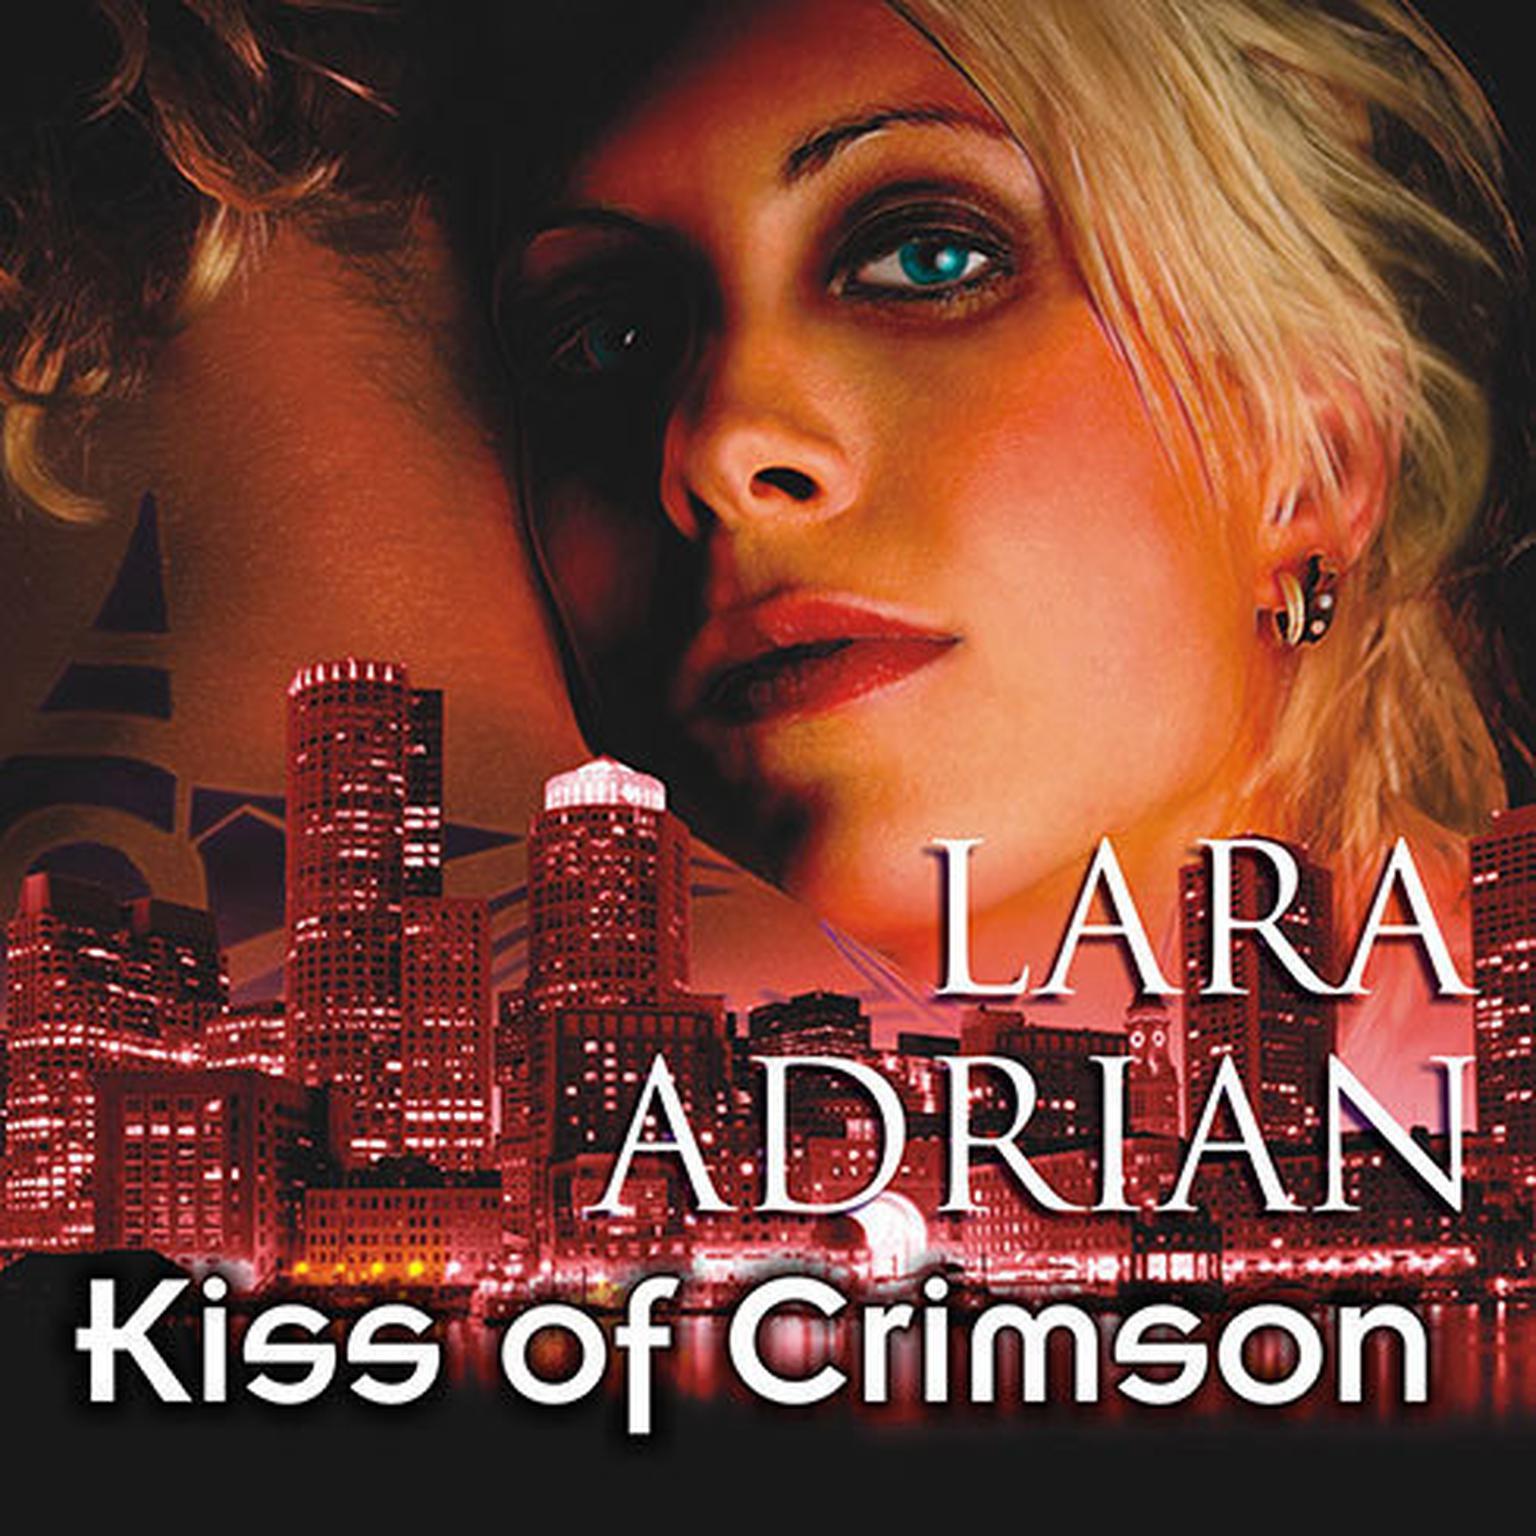 Printable Kiss of Crimson Audiobook Cover Art